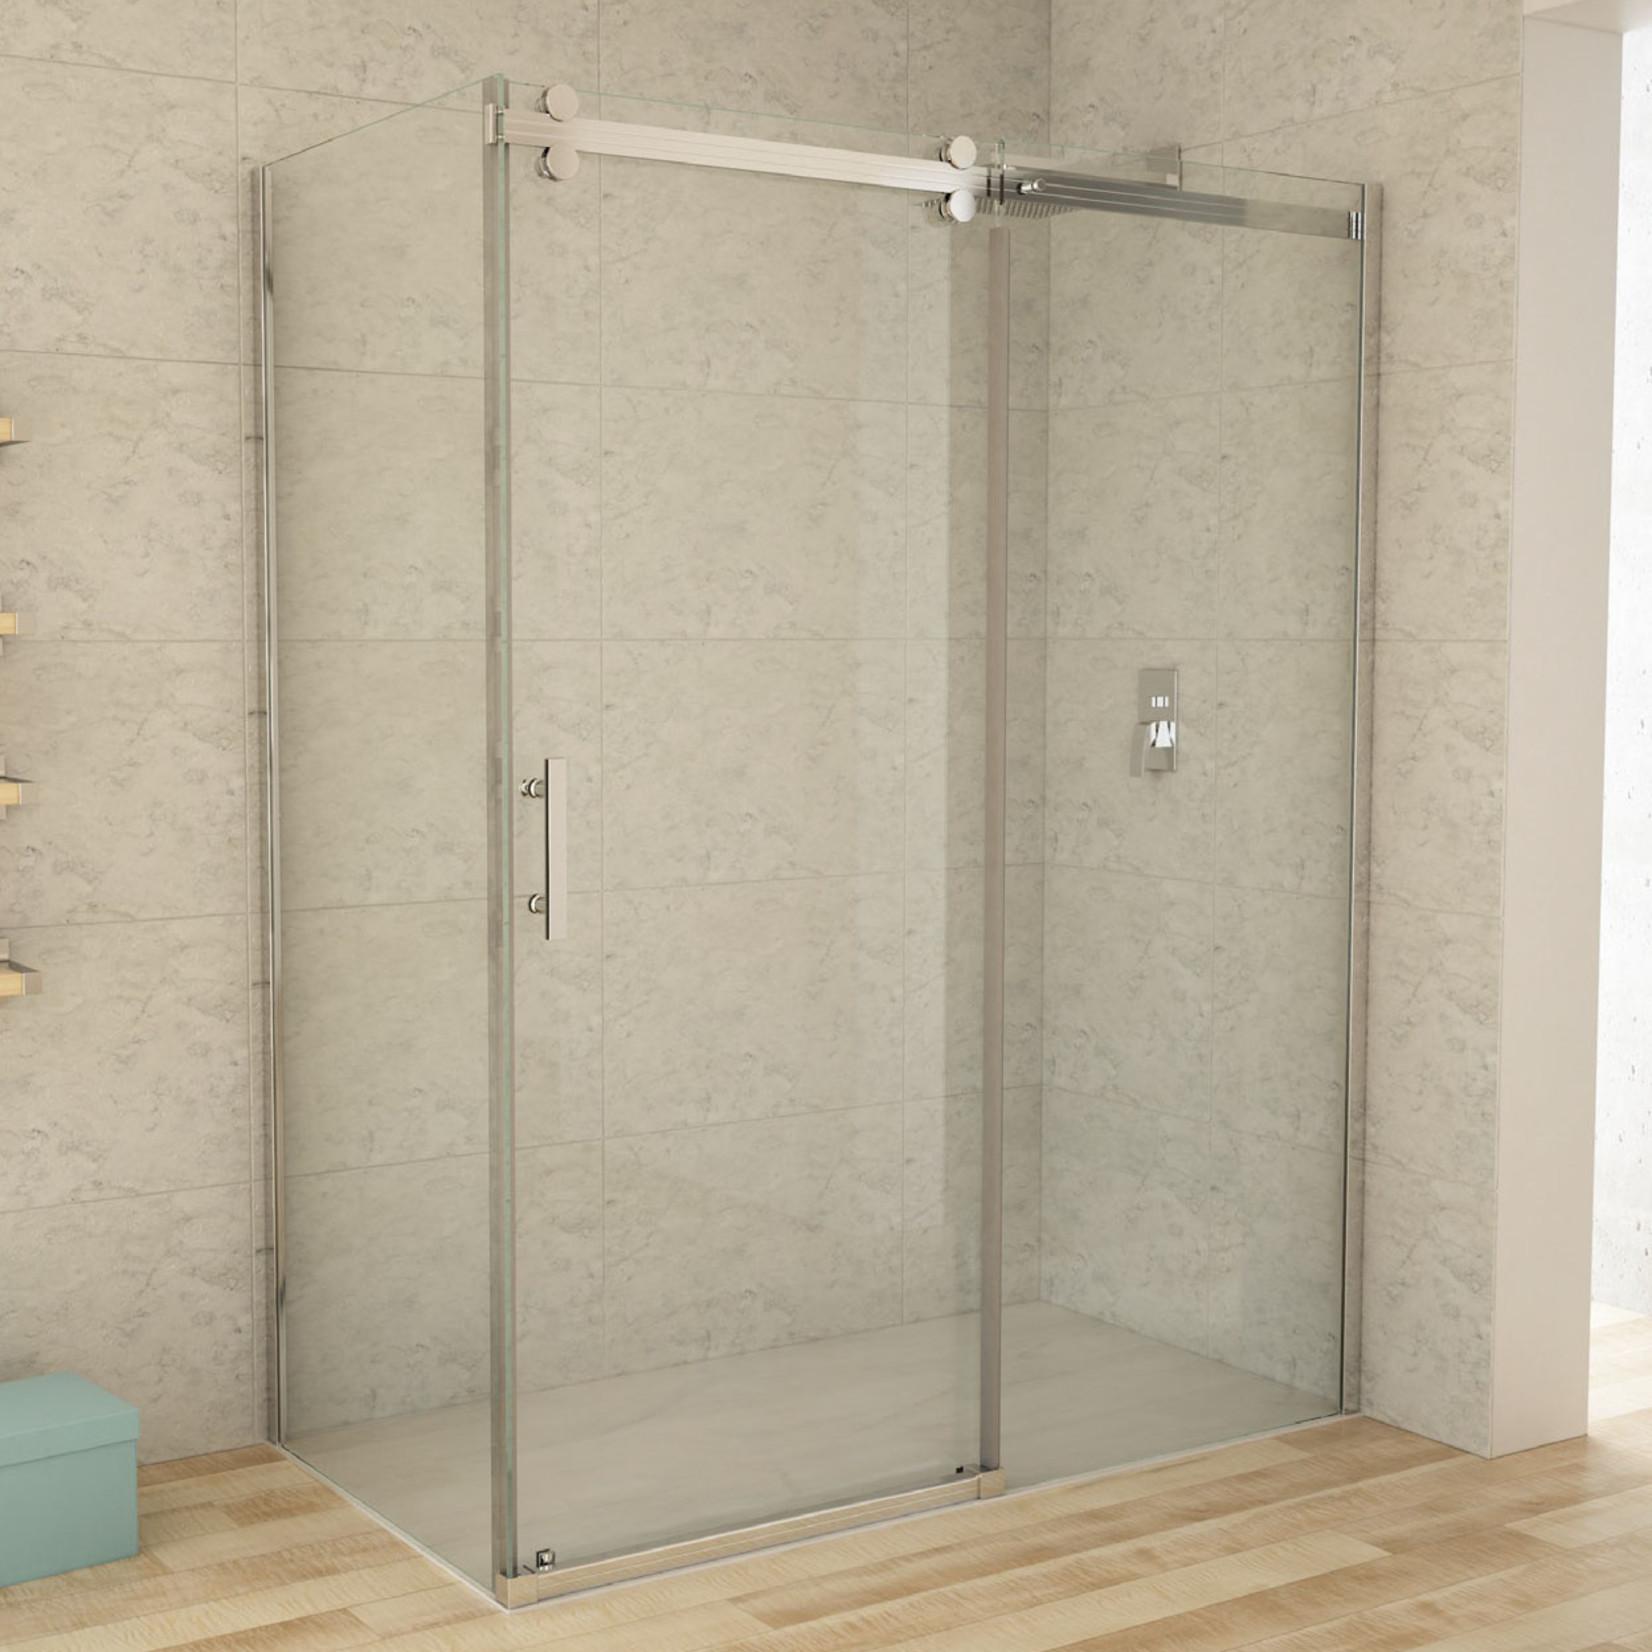 Reversible chrome shower set 32x48 CDC